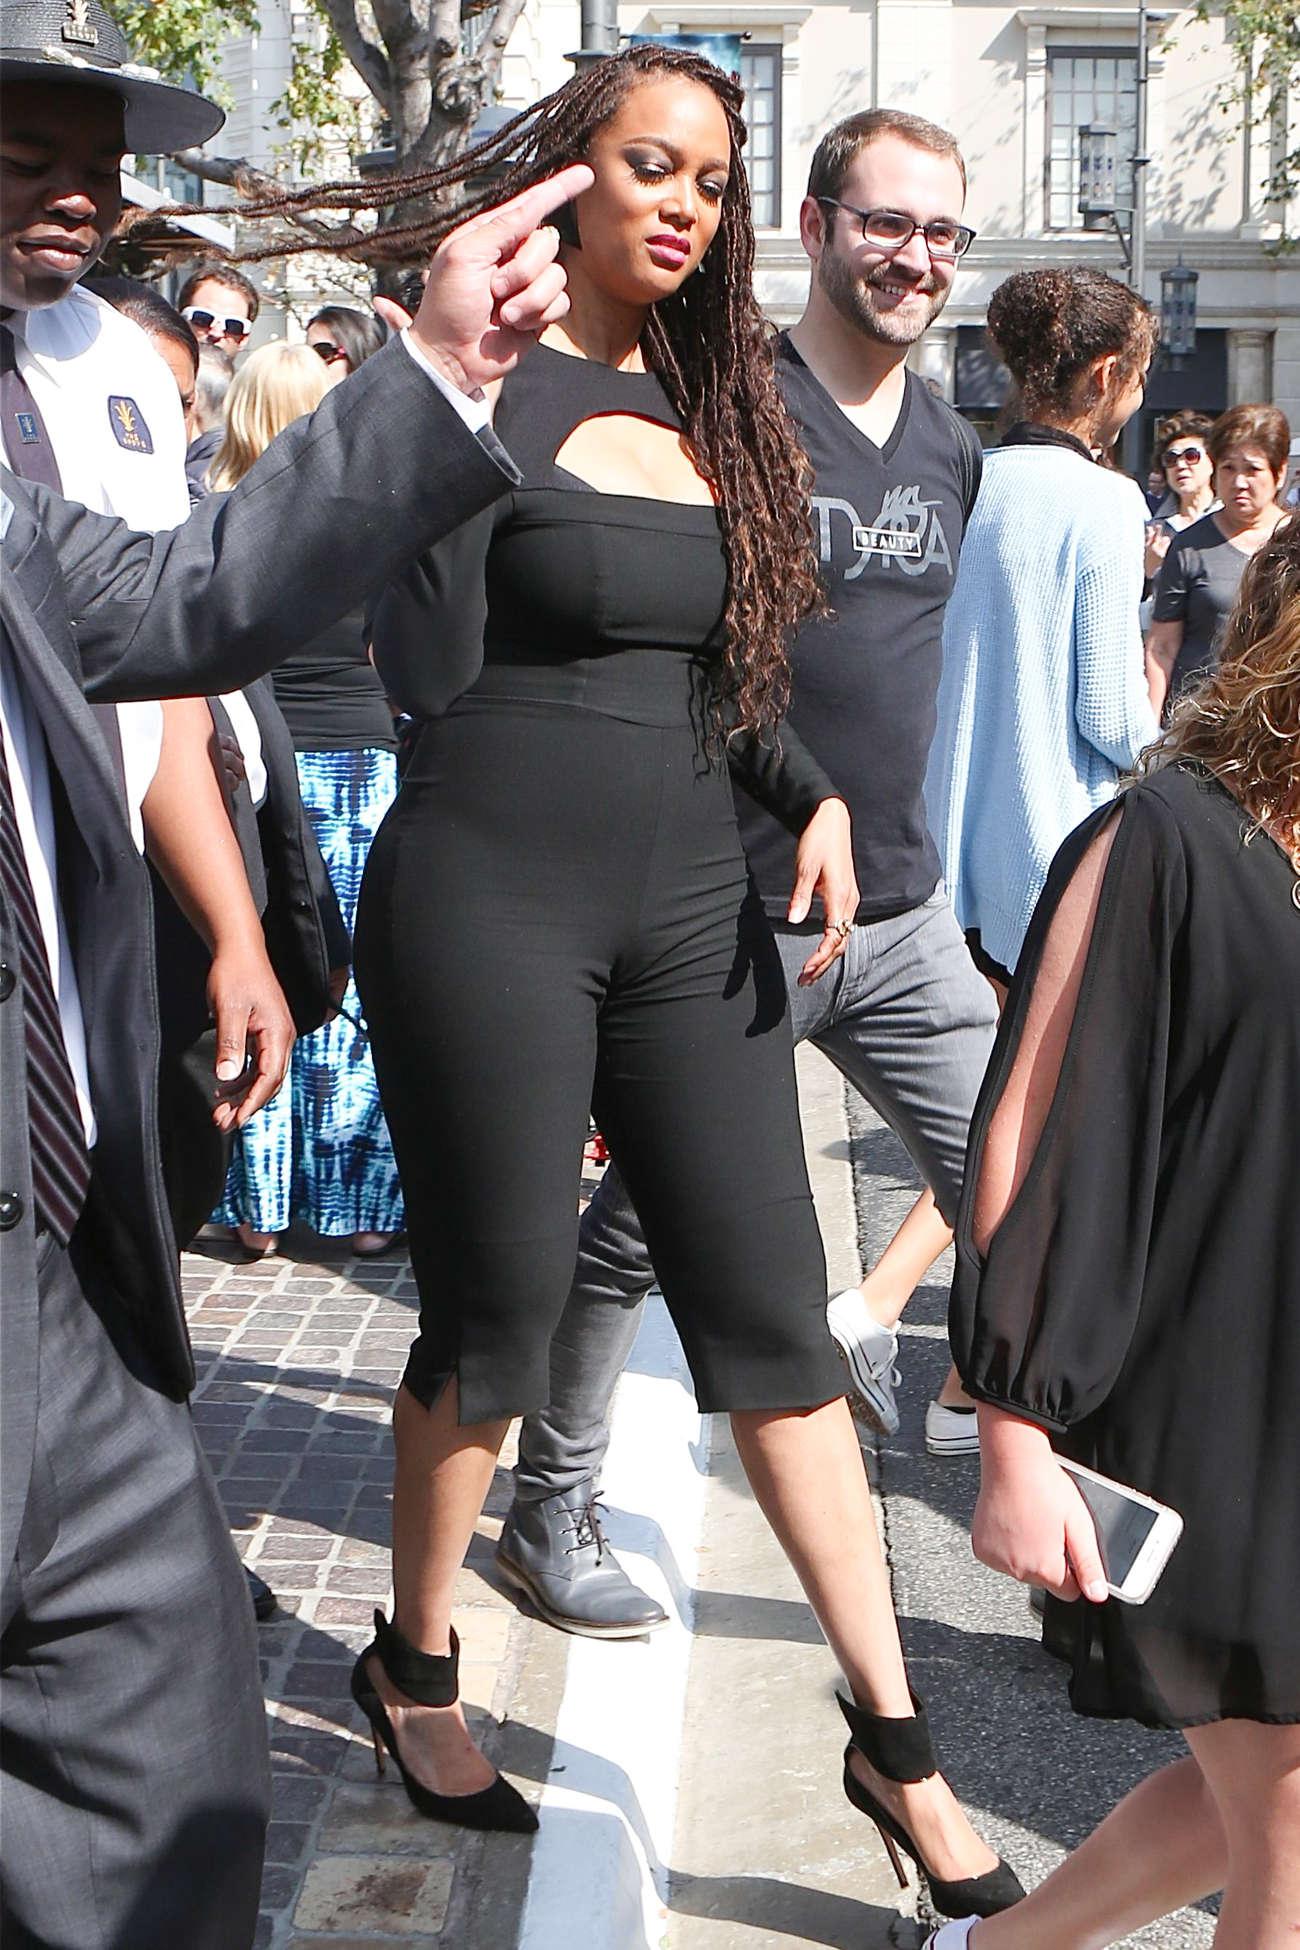 Biggest female pussy